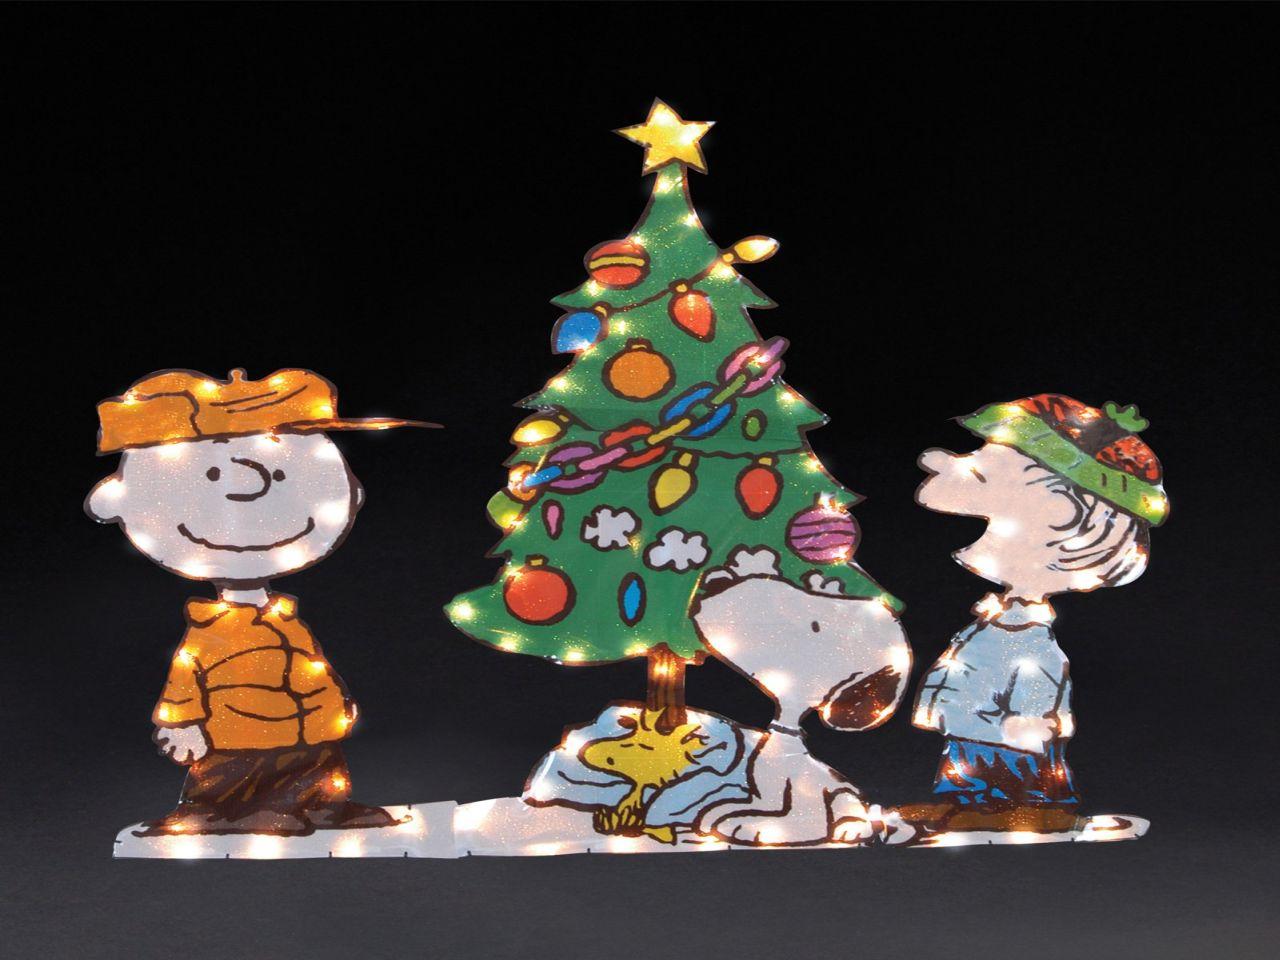 Wallpaper Mansion: Charlie Brown Christmas Wallpaper